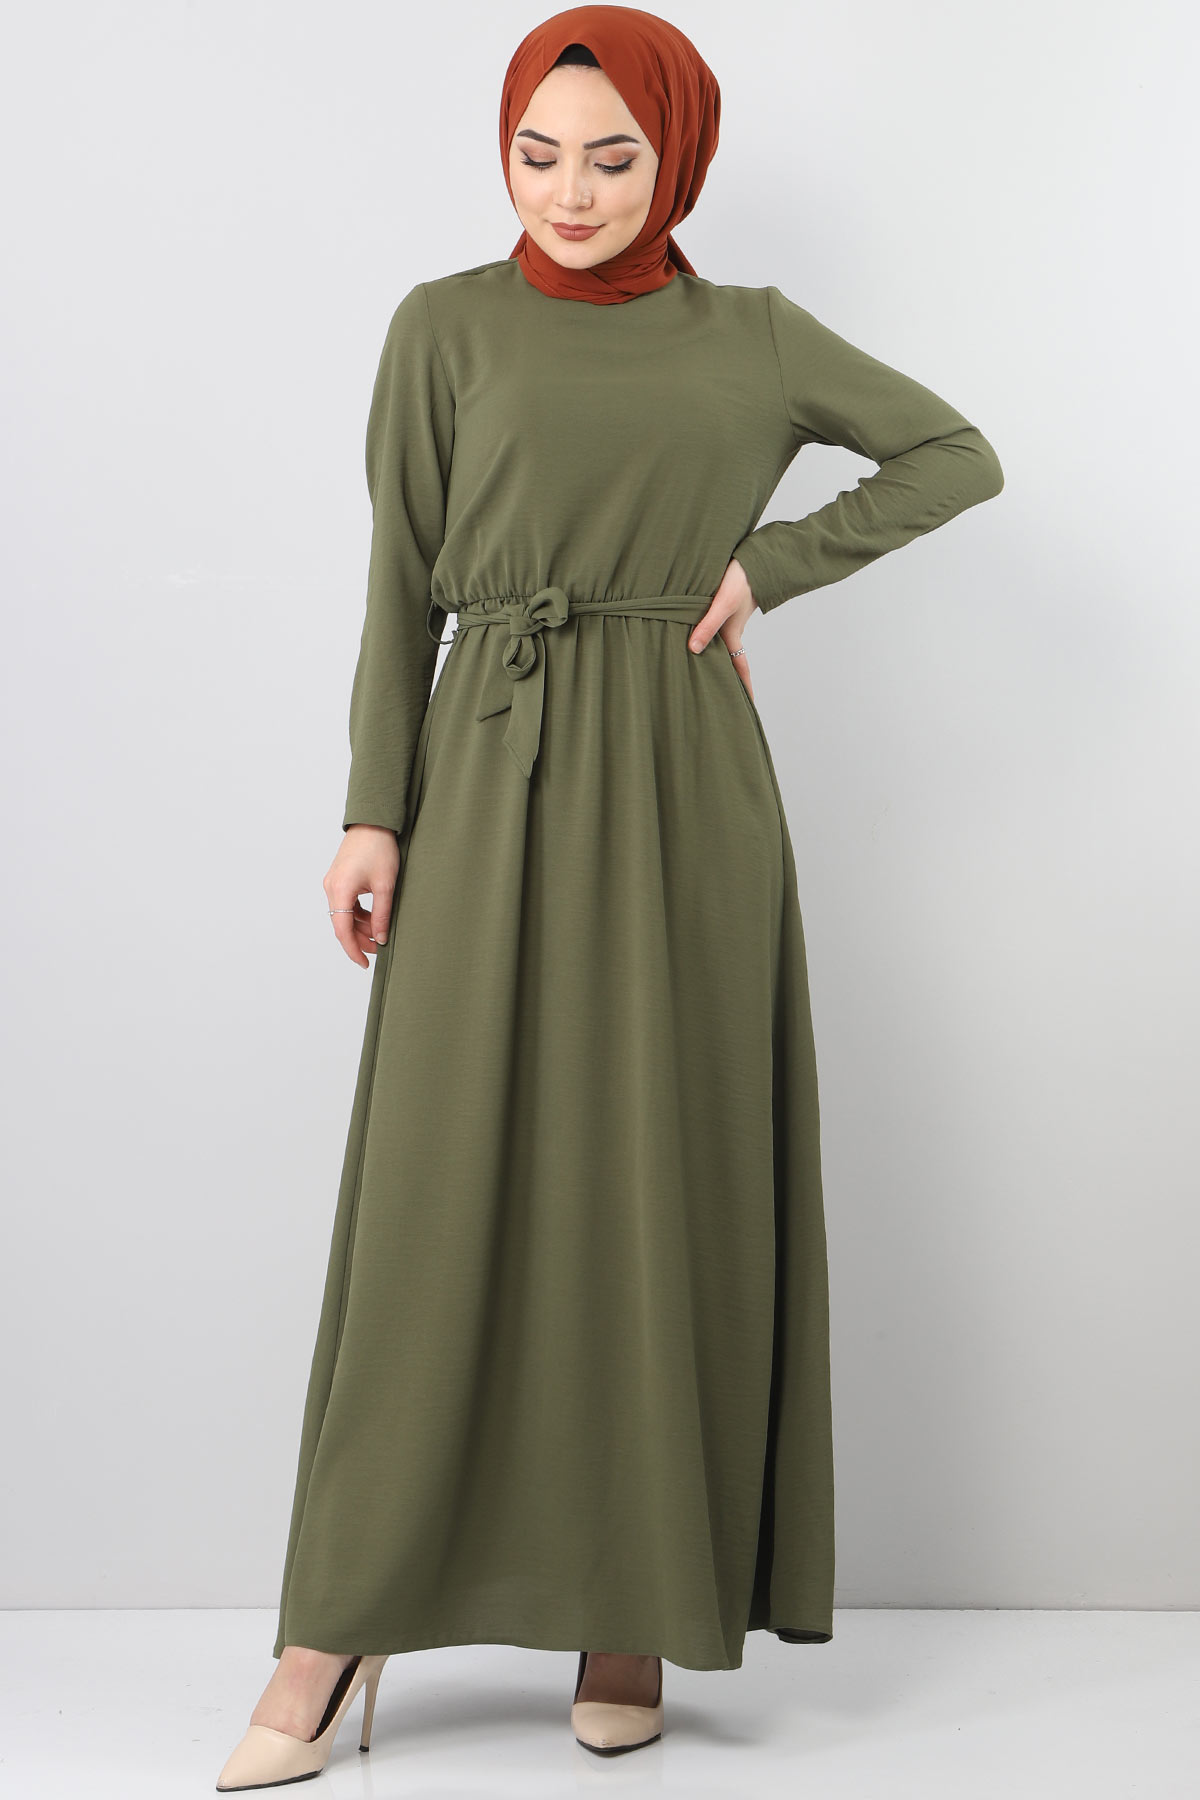 Beli Lastikli Ayrobin Elbise TSD5521 Haki